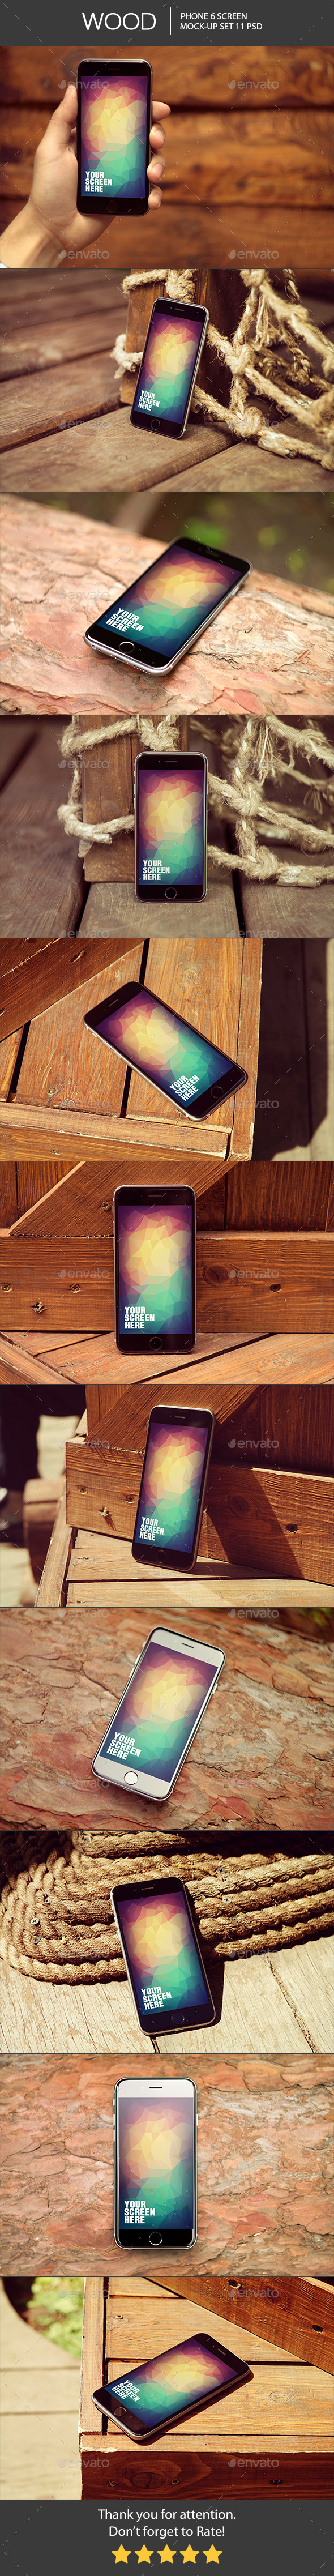 Wood Phone 6 Mock-Up